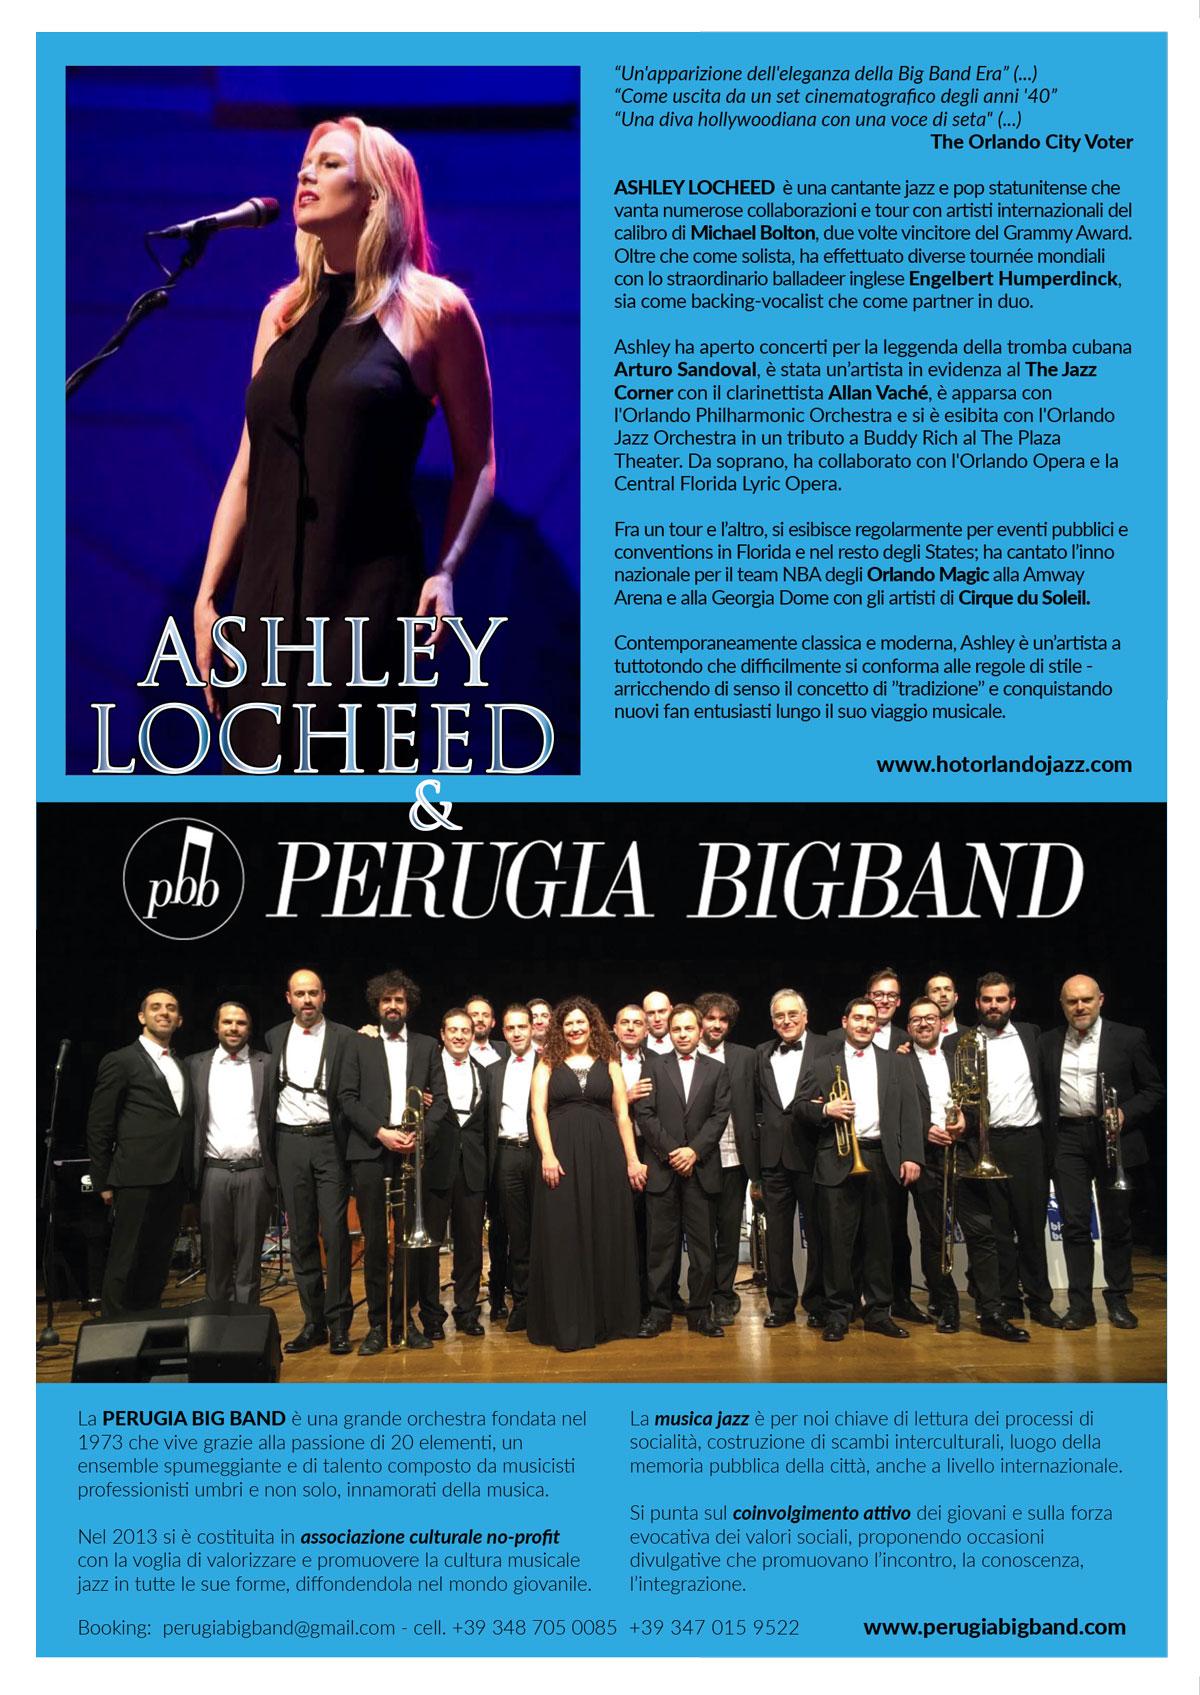 ASHLEY LOCHEED Perugia-Big Band Promo-MARSCIANO-A5-PRINT